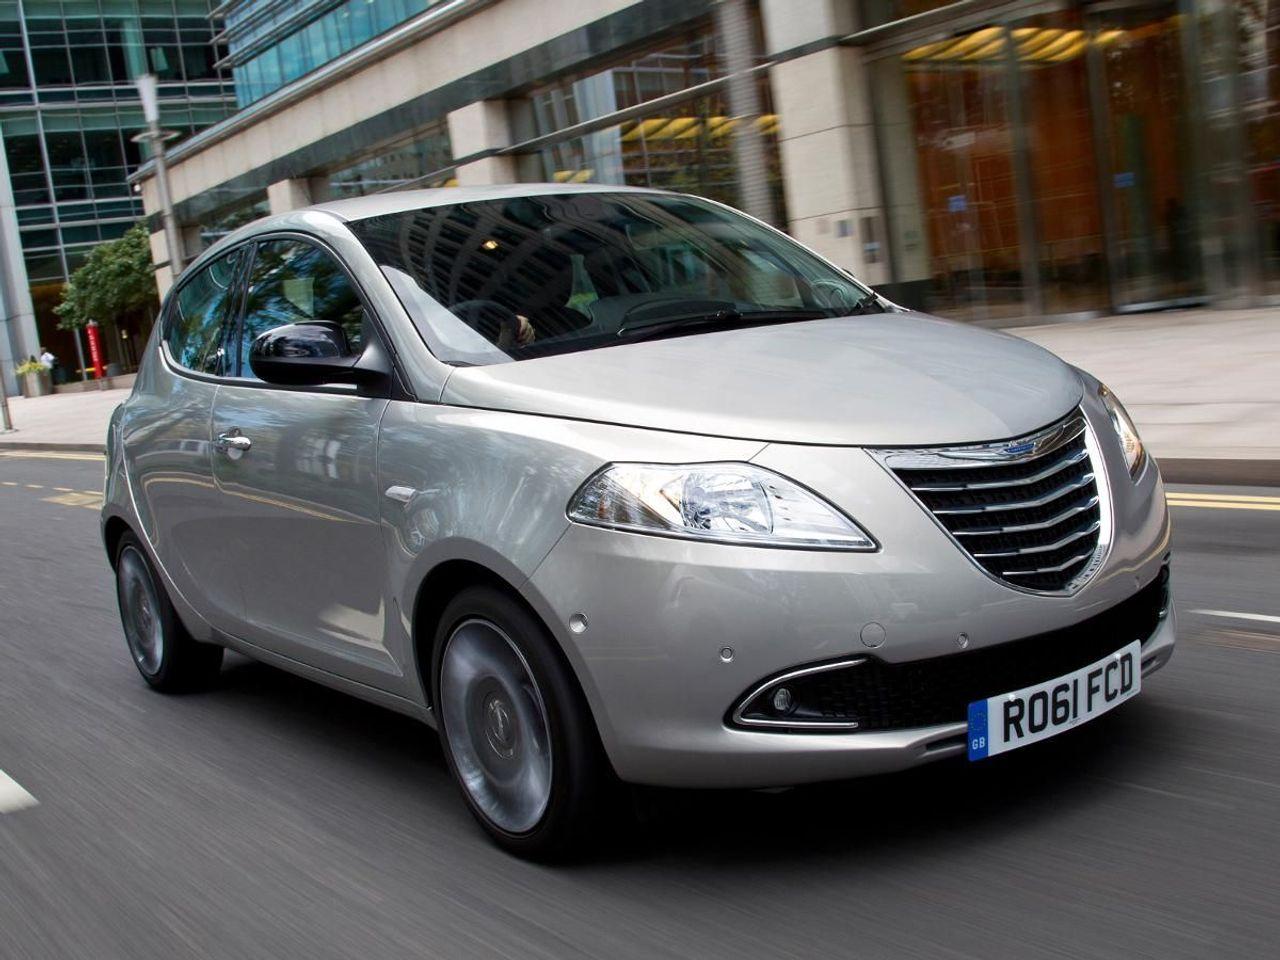 Chrysler Ypsilon hatchback